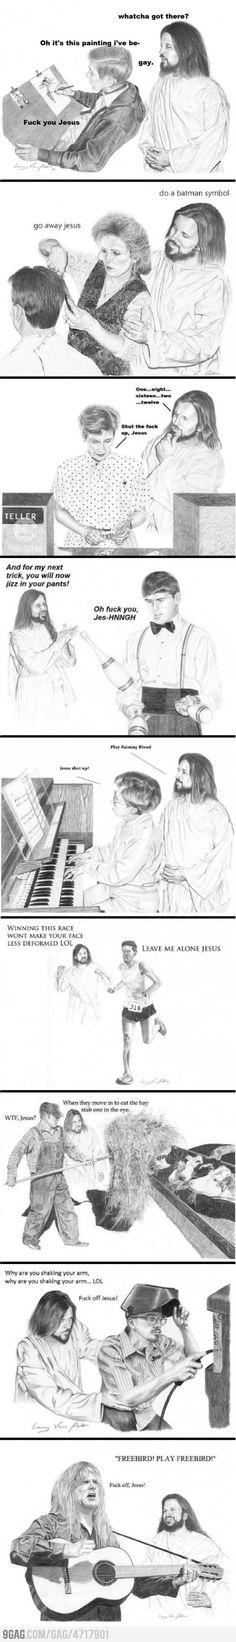 Just annoying Jesus